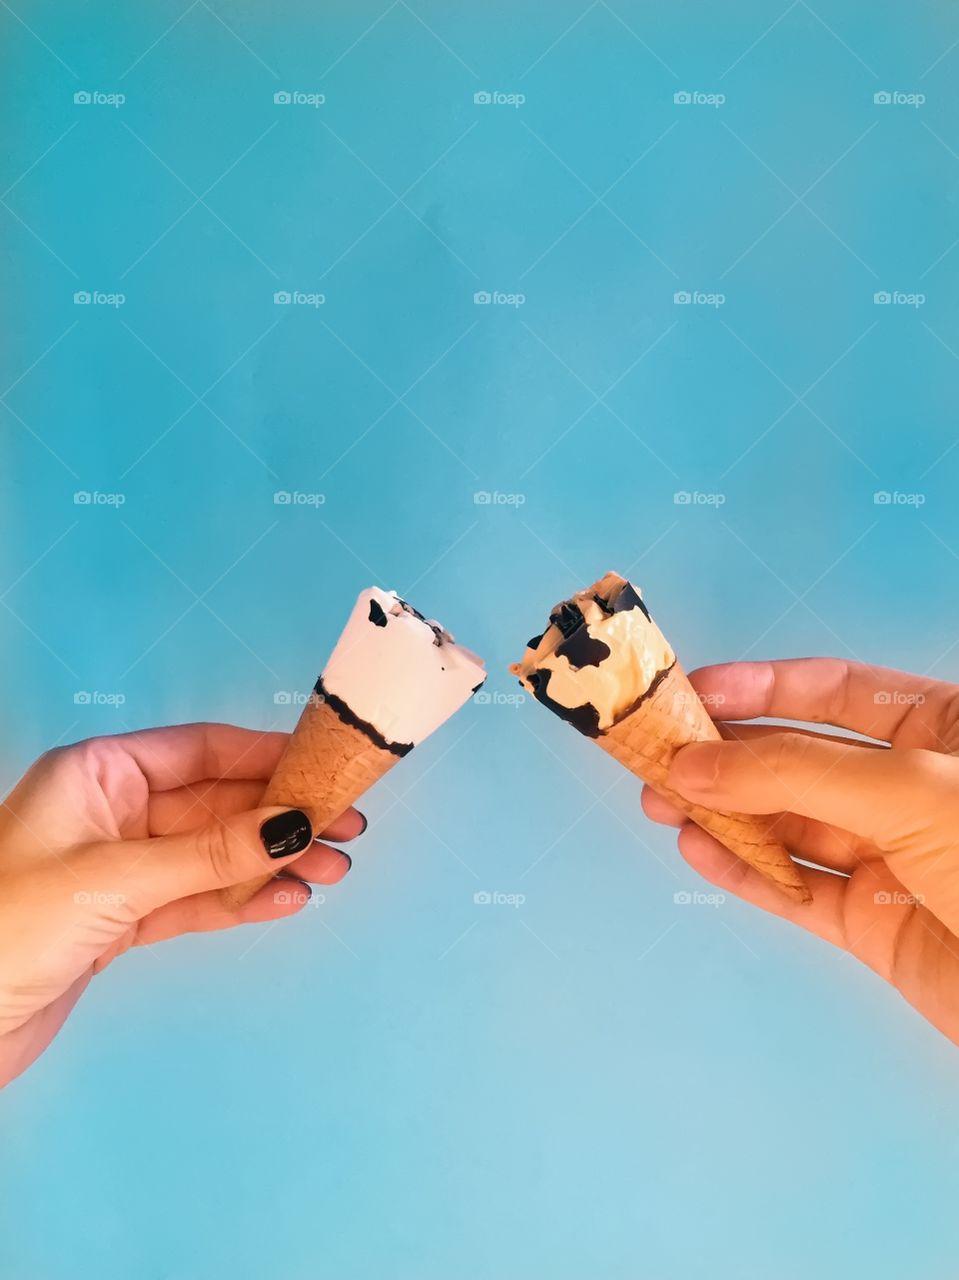 Woman hand holding an ice cream cone